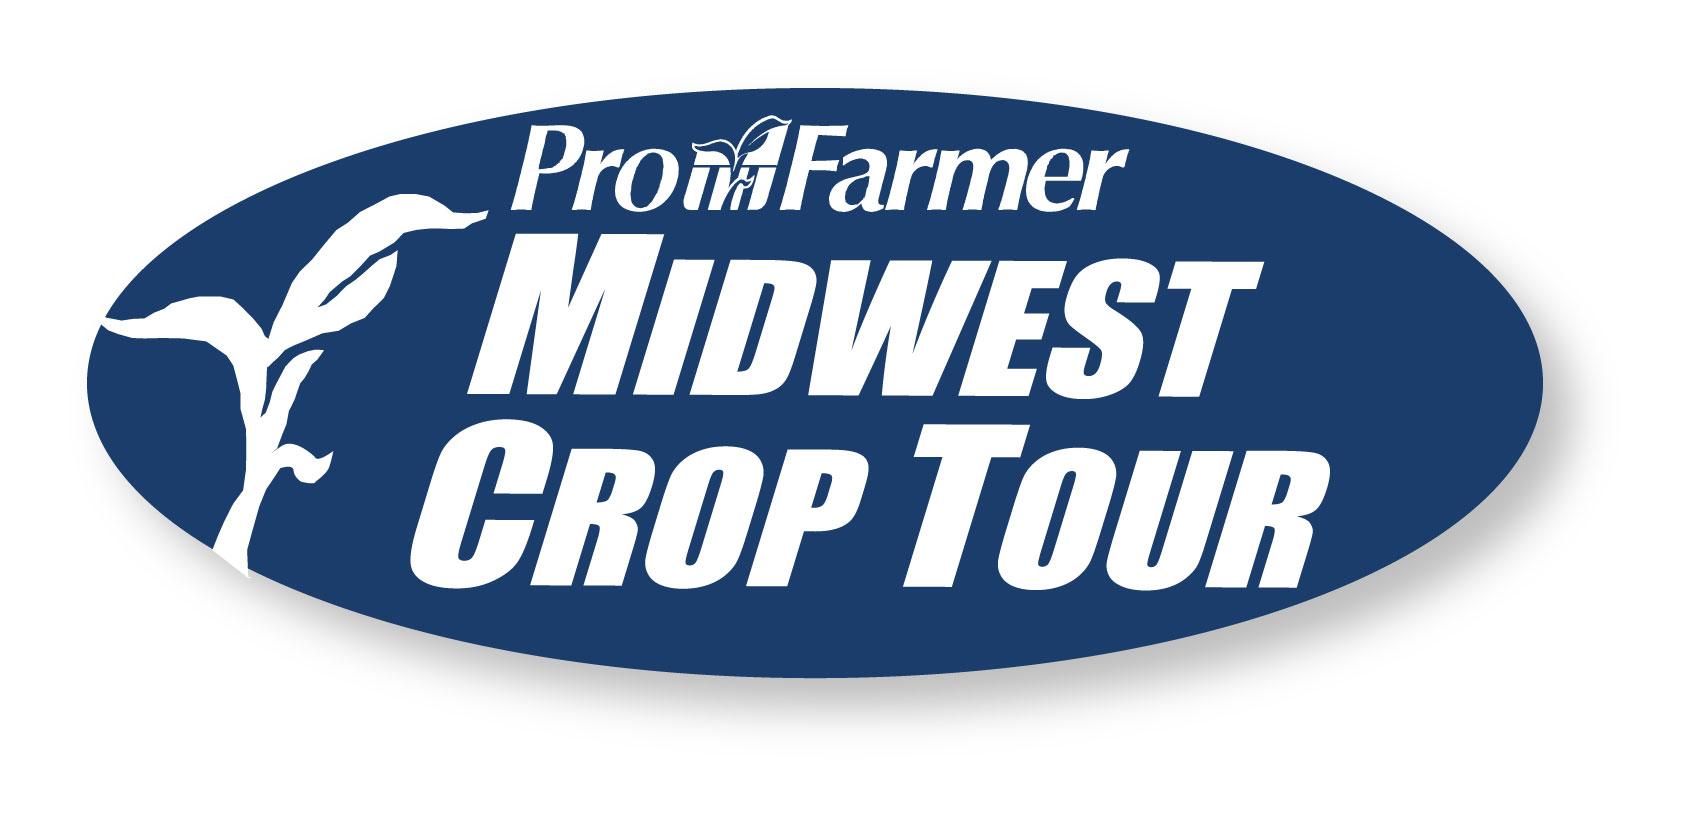 Pro Farmer Midwest Crop Tour – Ohio